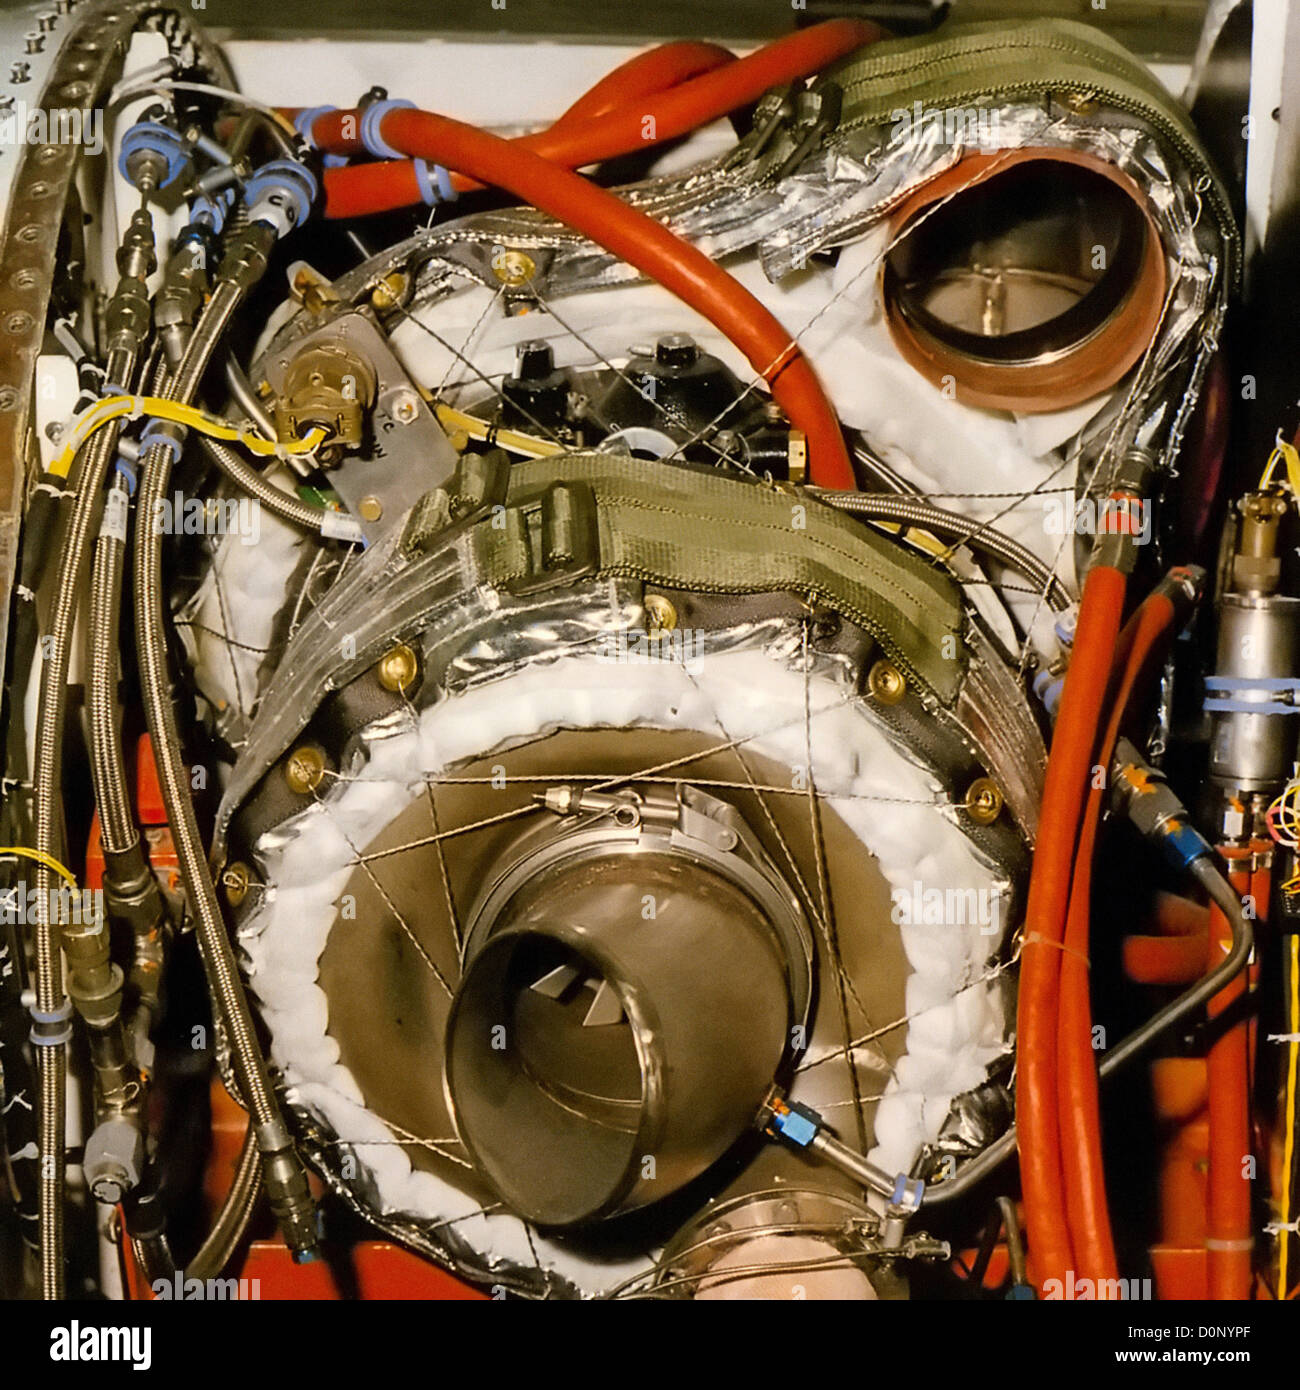 Turbo-Compressor in Upper Fuselage of F-16 - Stock Image